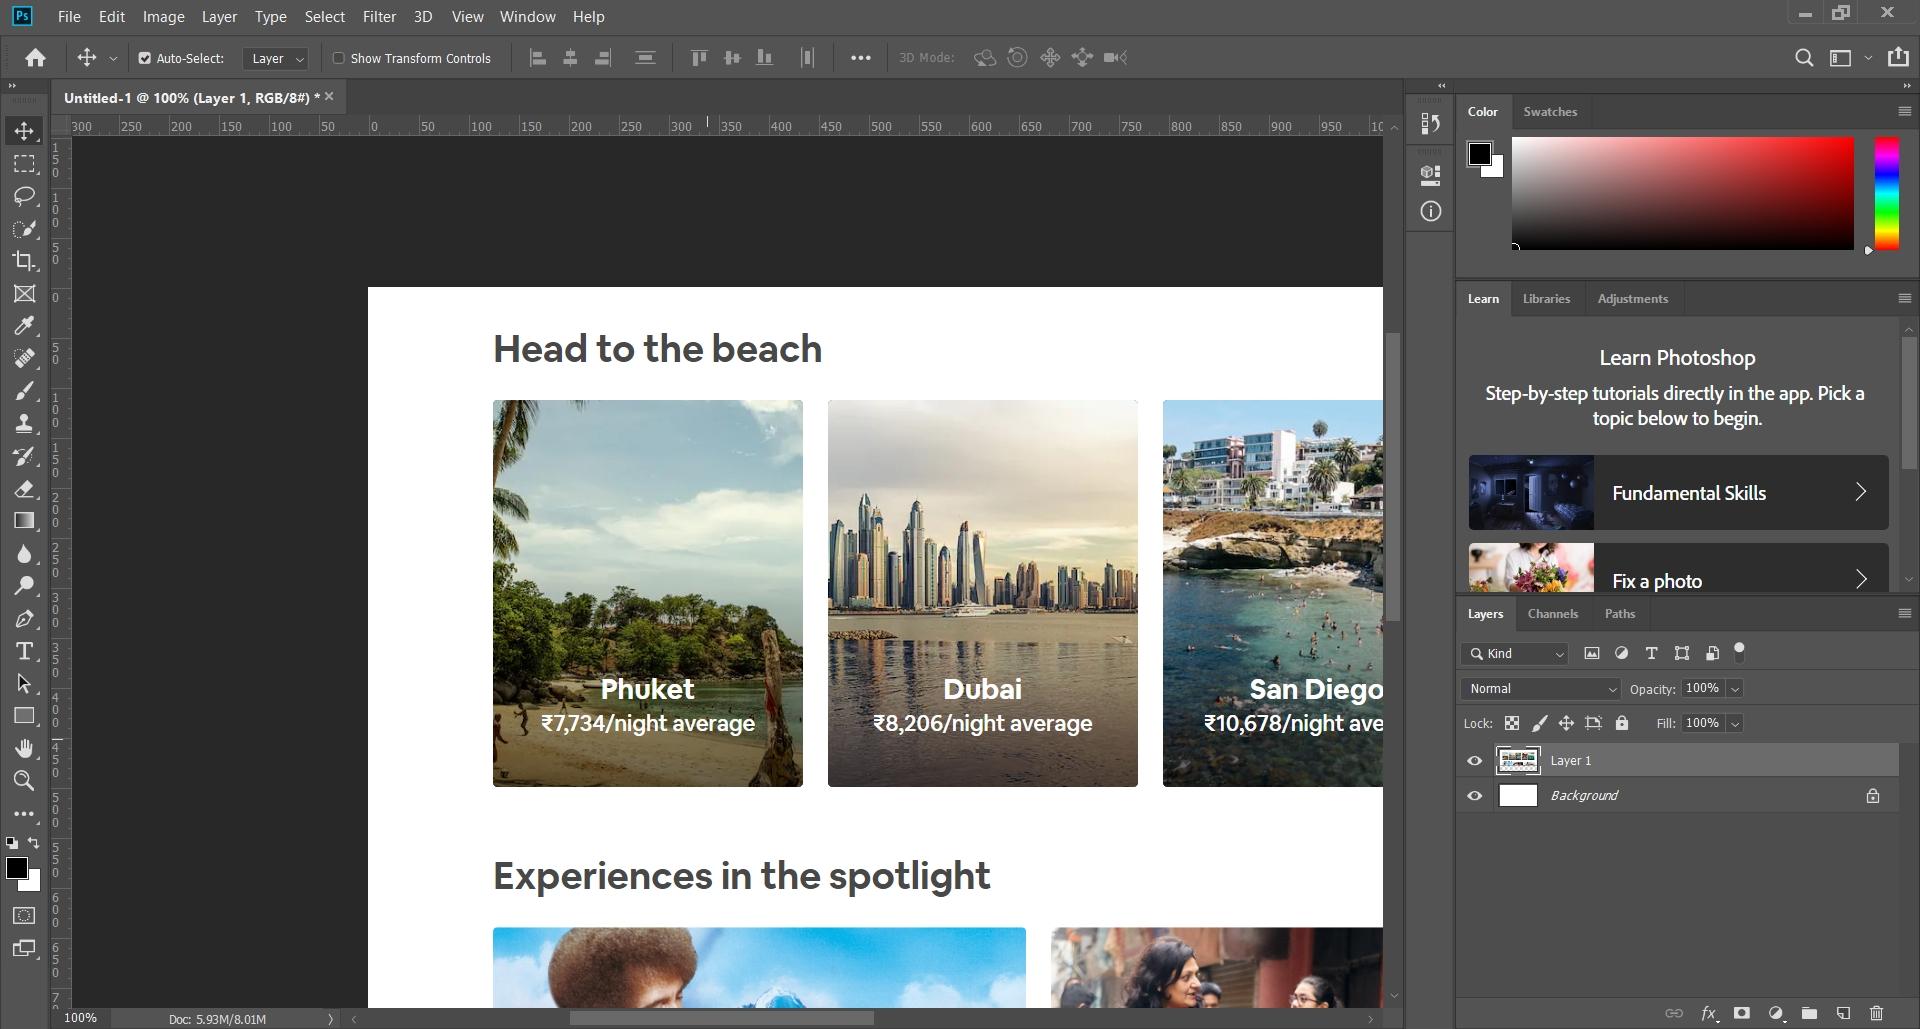 Photoshop Designing Tool